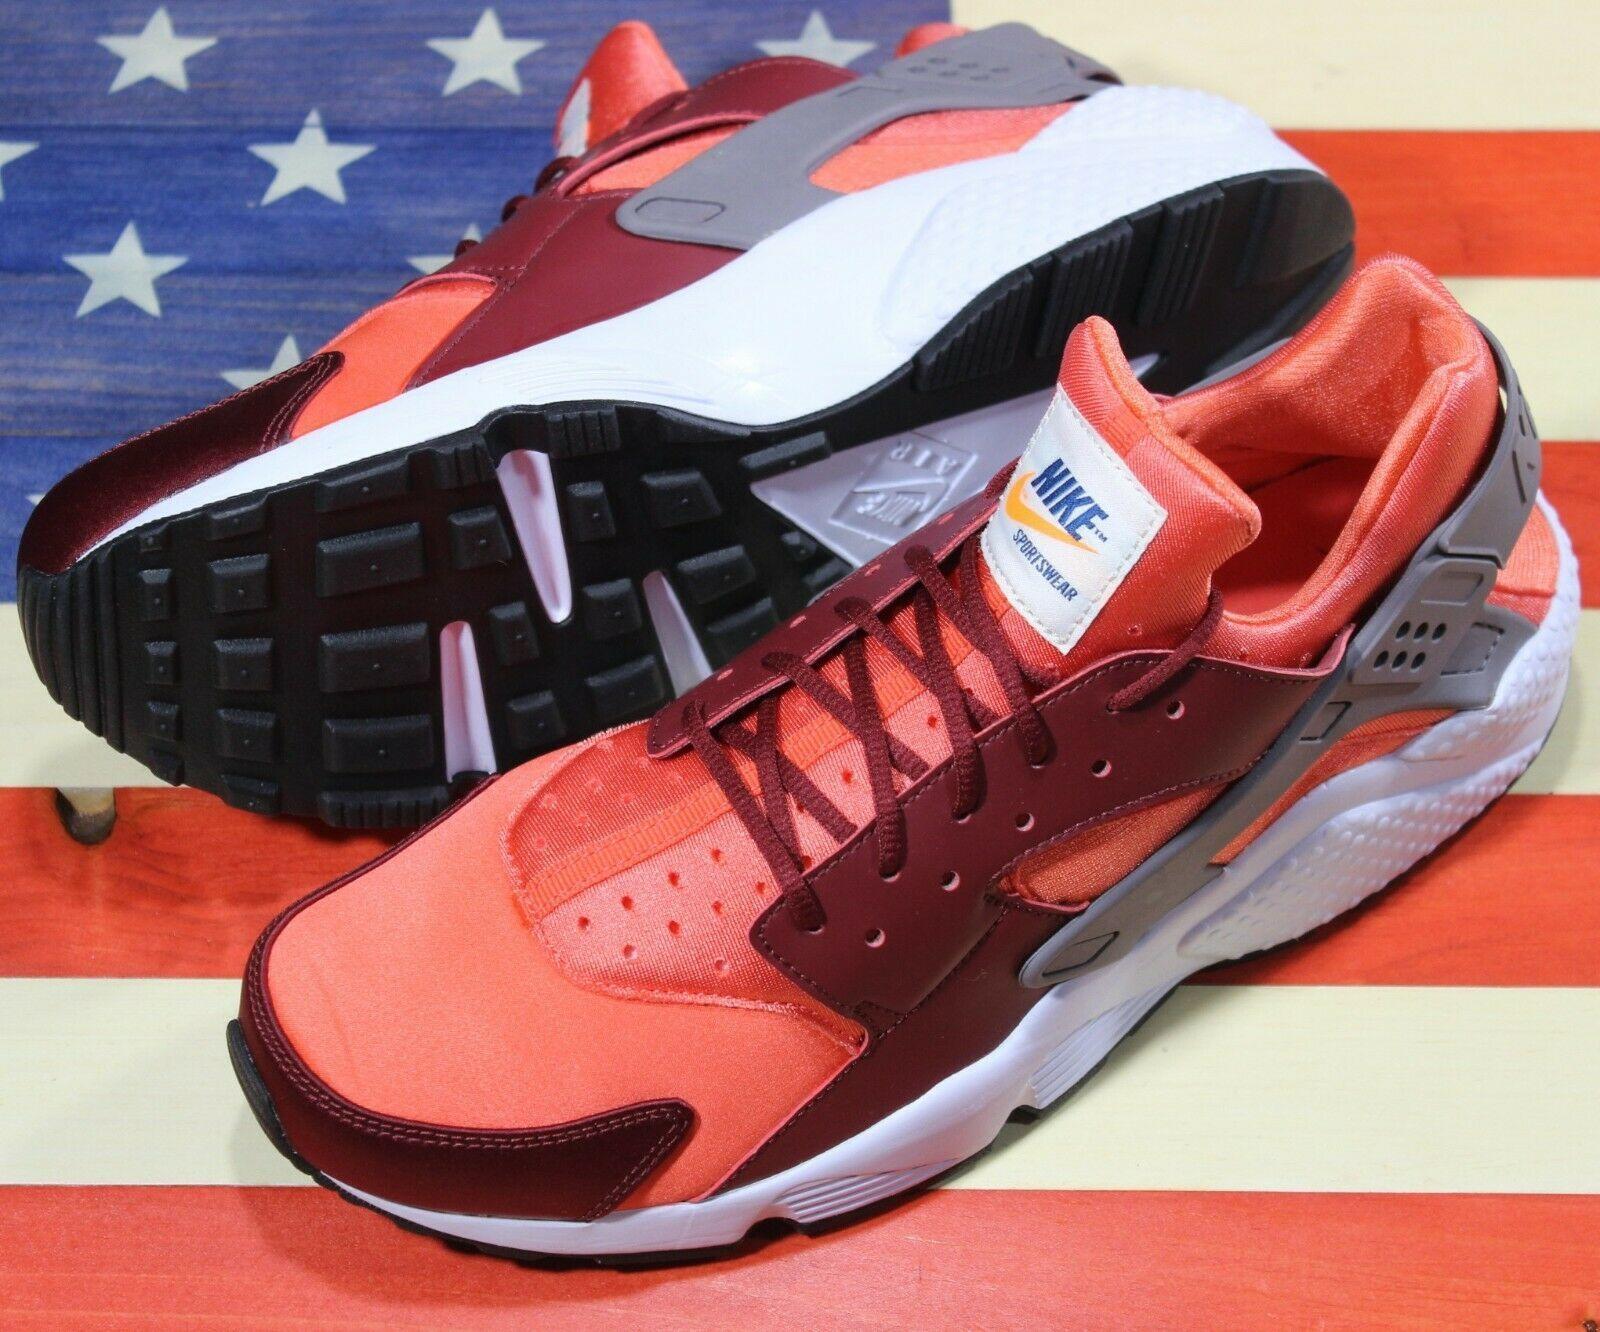 Nike Air Huarache Run Running Shoes Team Red Coral White [318429-054] Men's 11.5 image 7